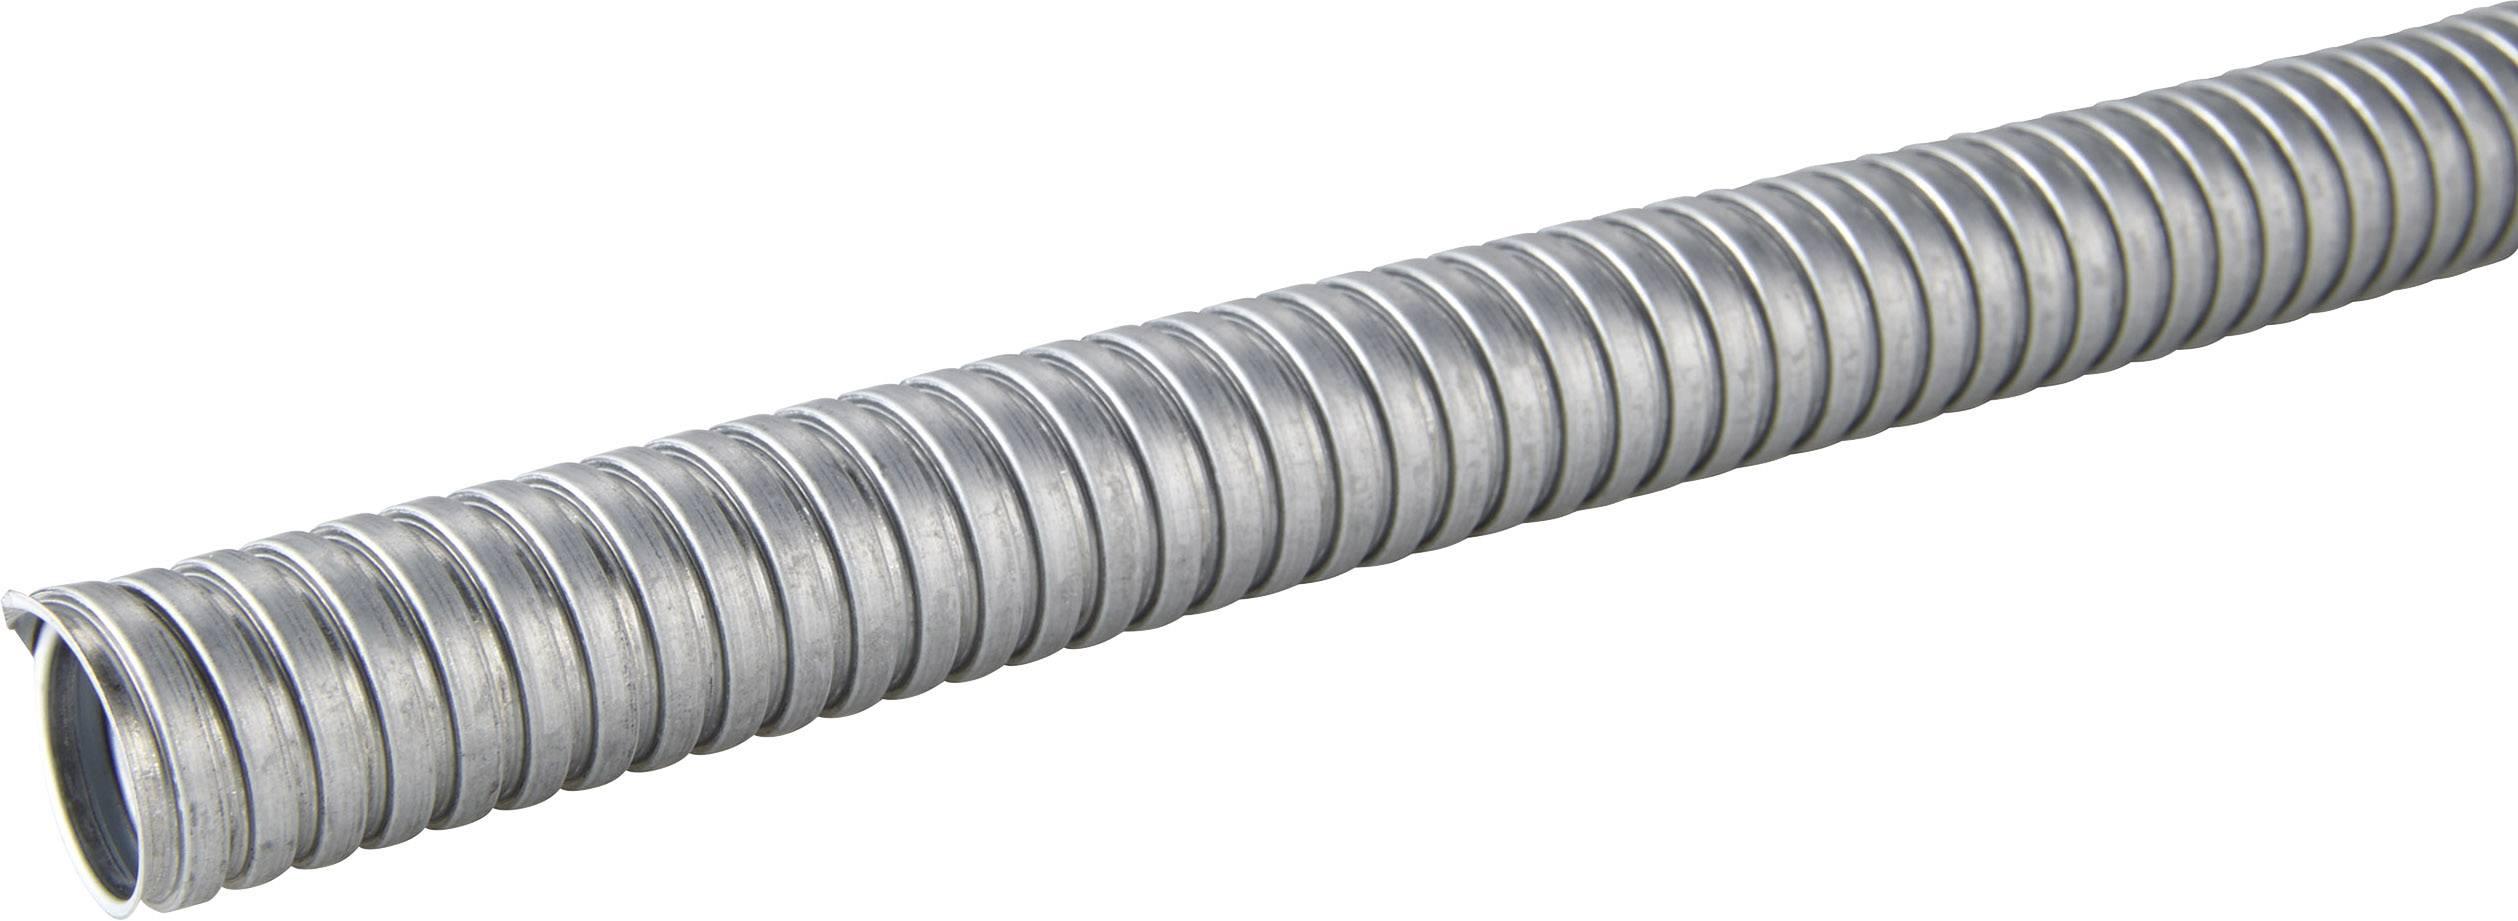 Ochranná hadice na kov LAPP SILVYN® AS 7/8x10 61802080, stříbrná, 50 m